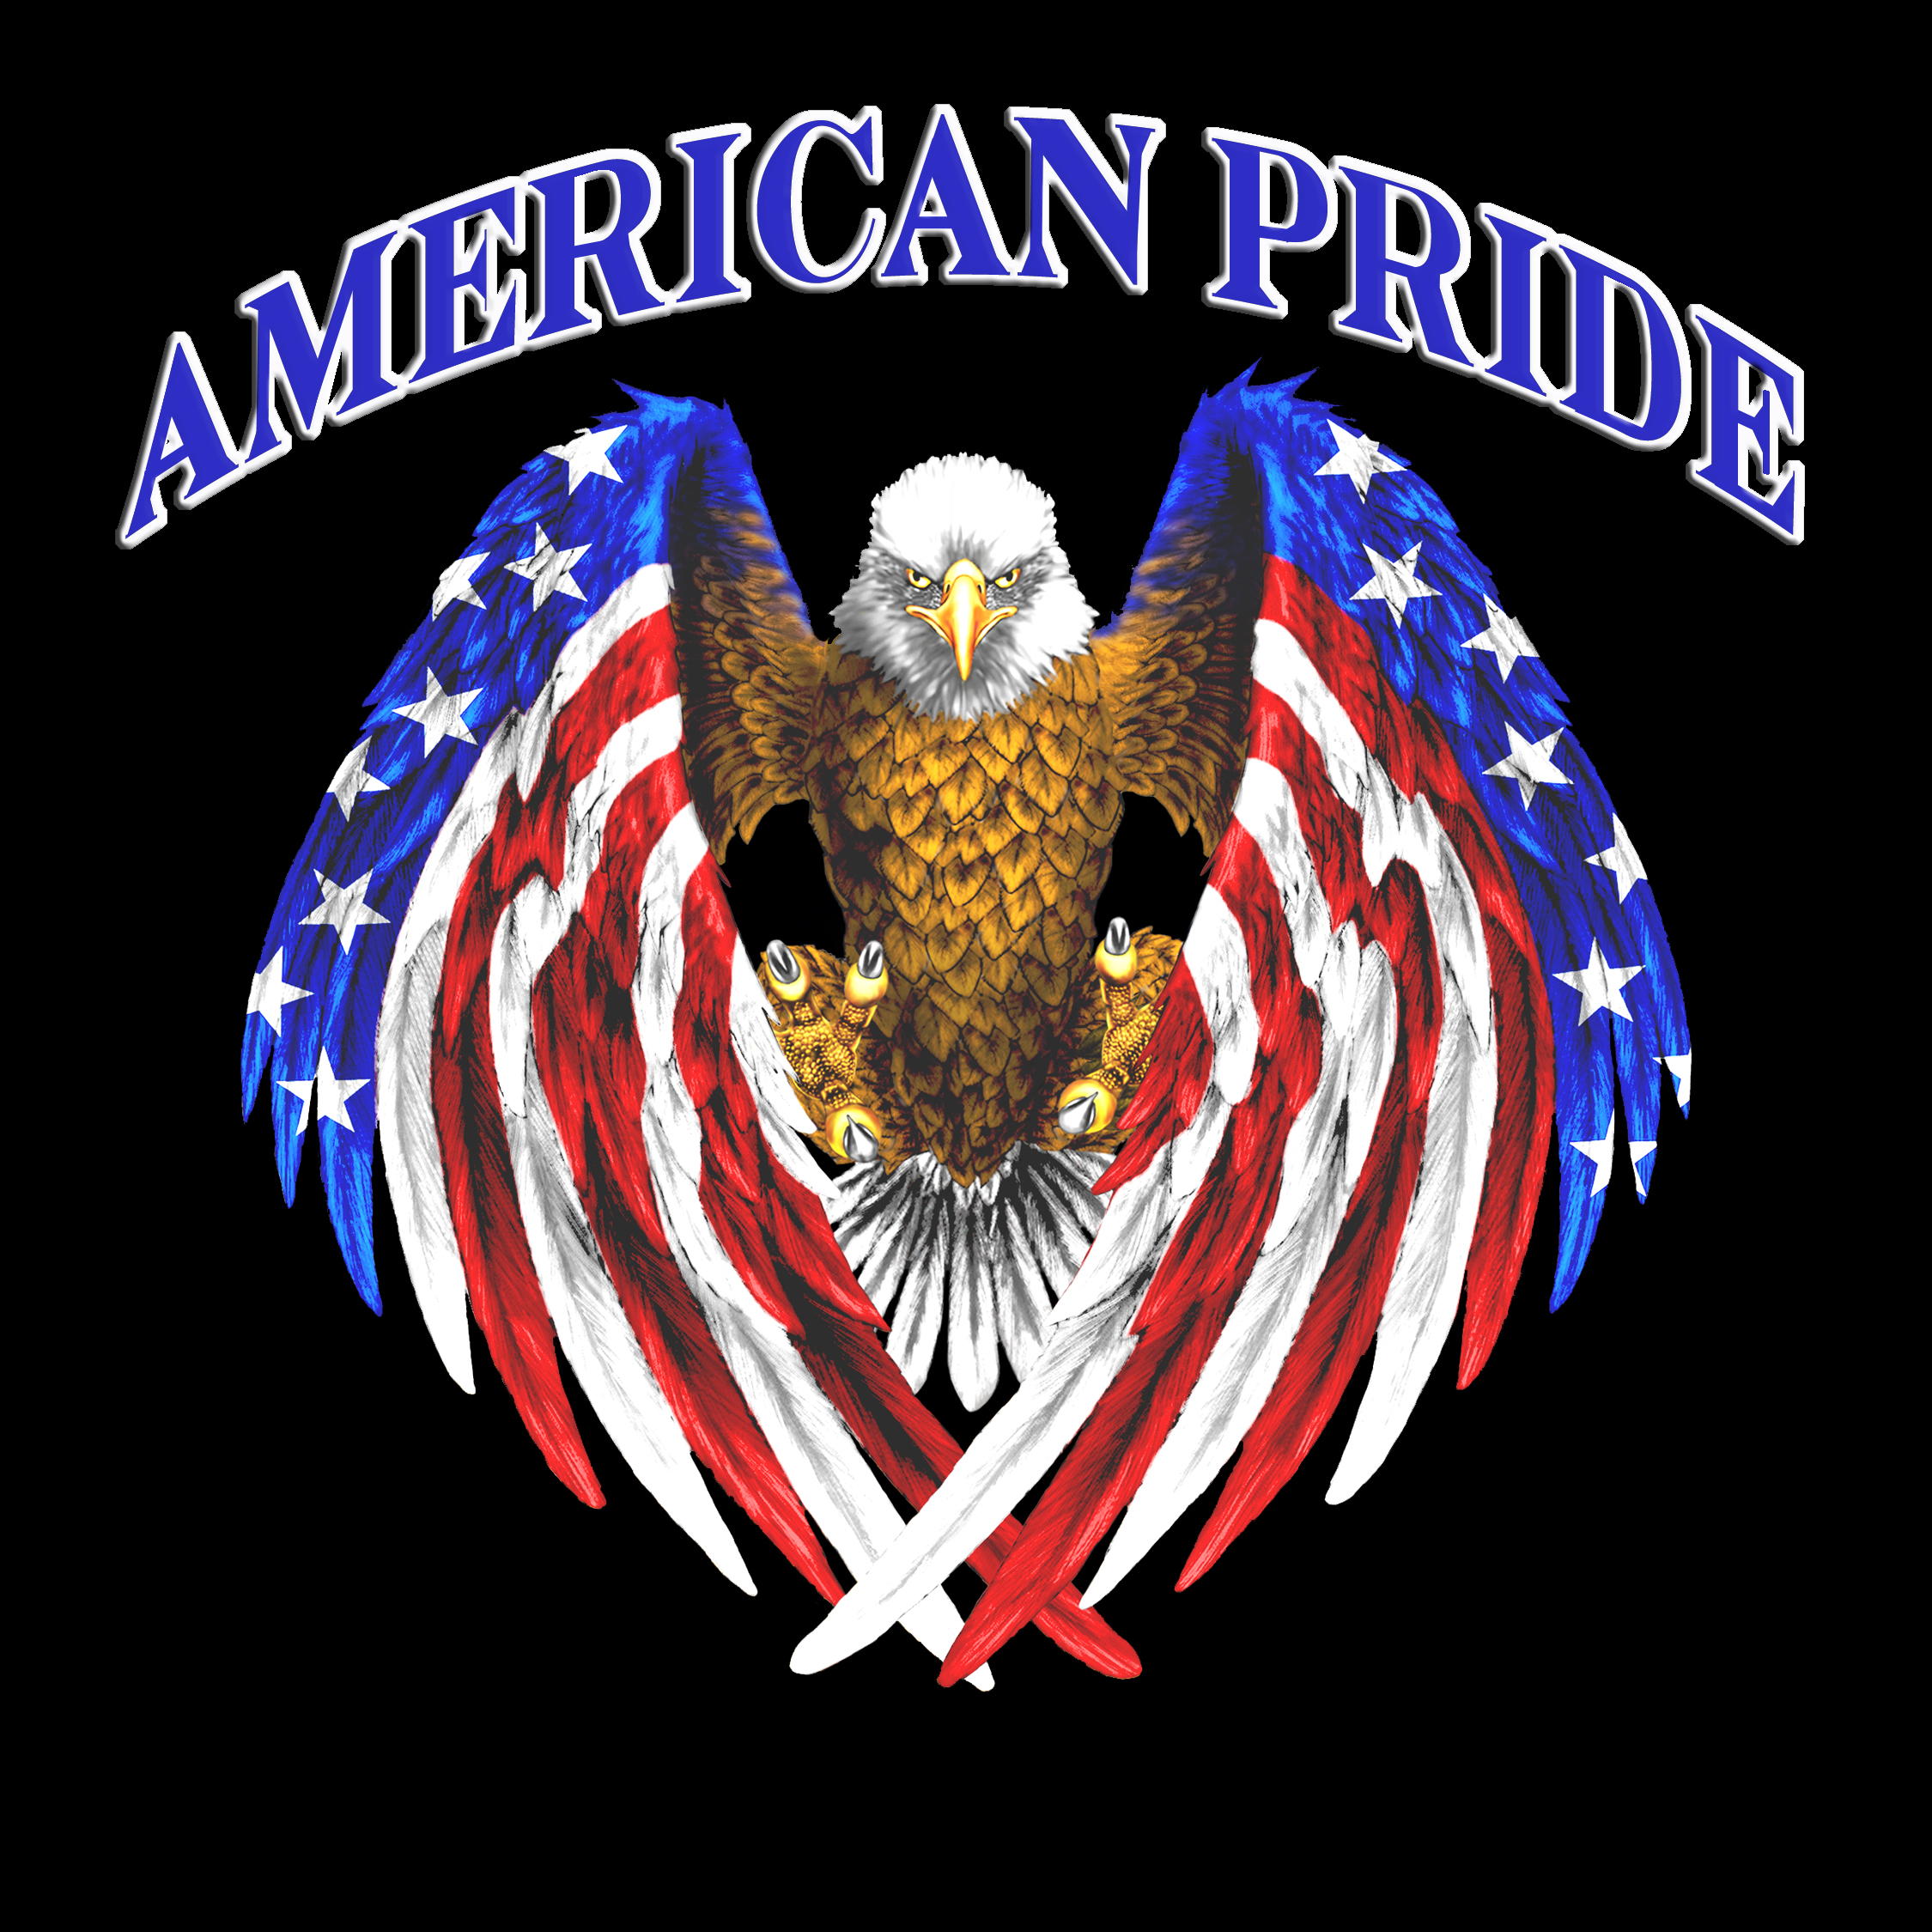 american pride tattoo. American pride